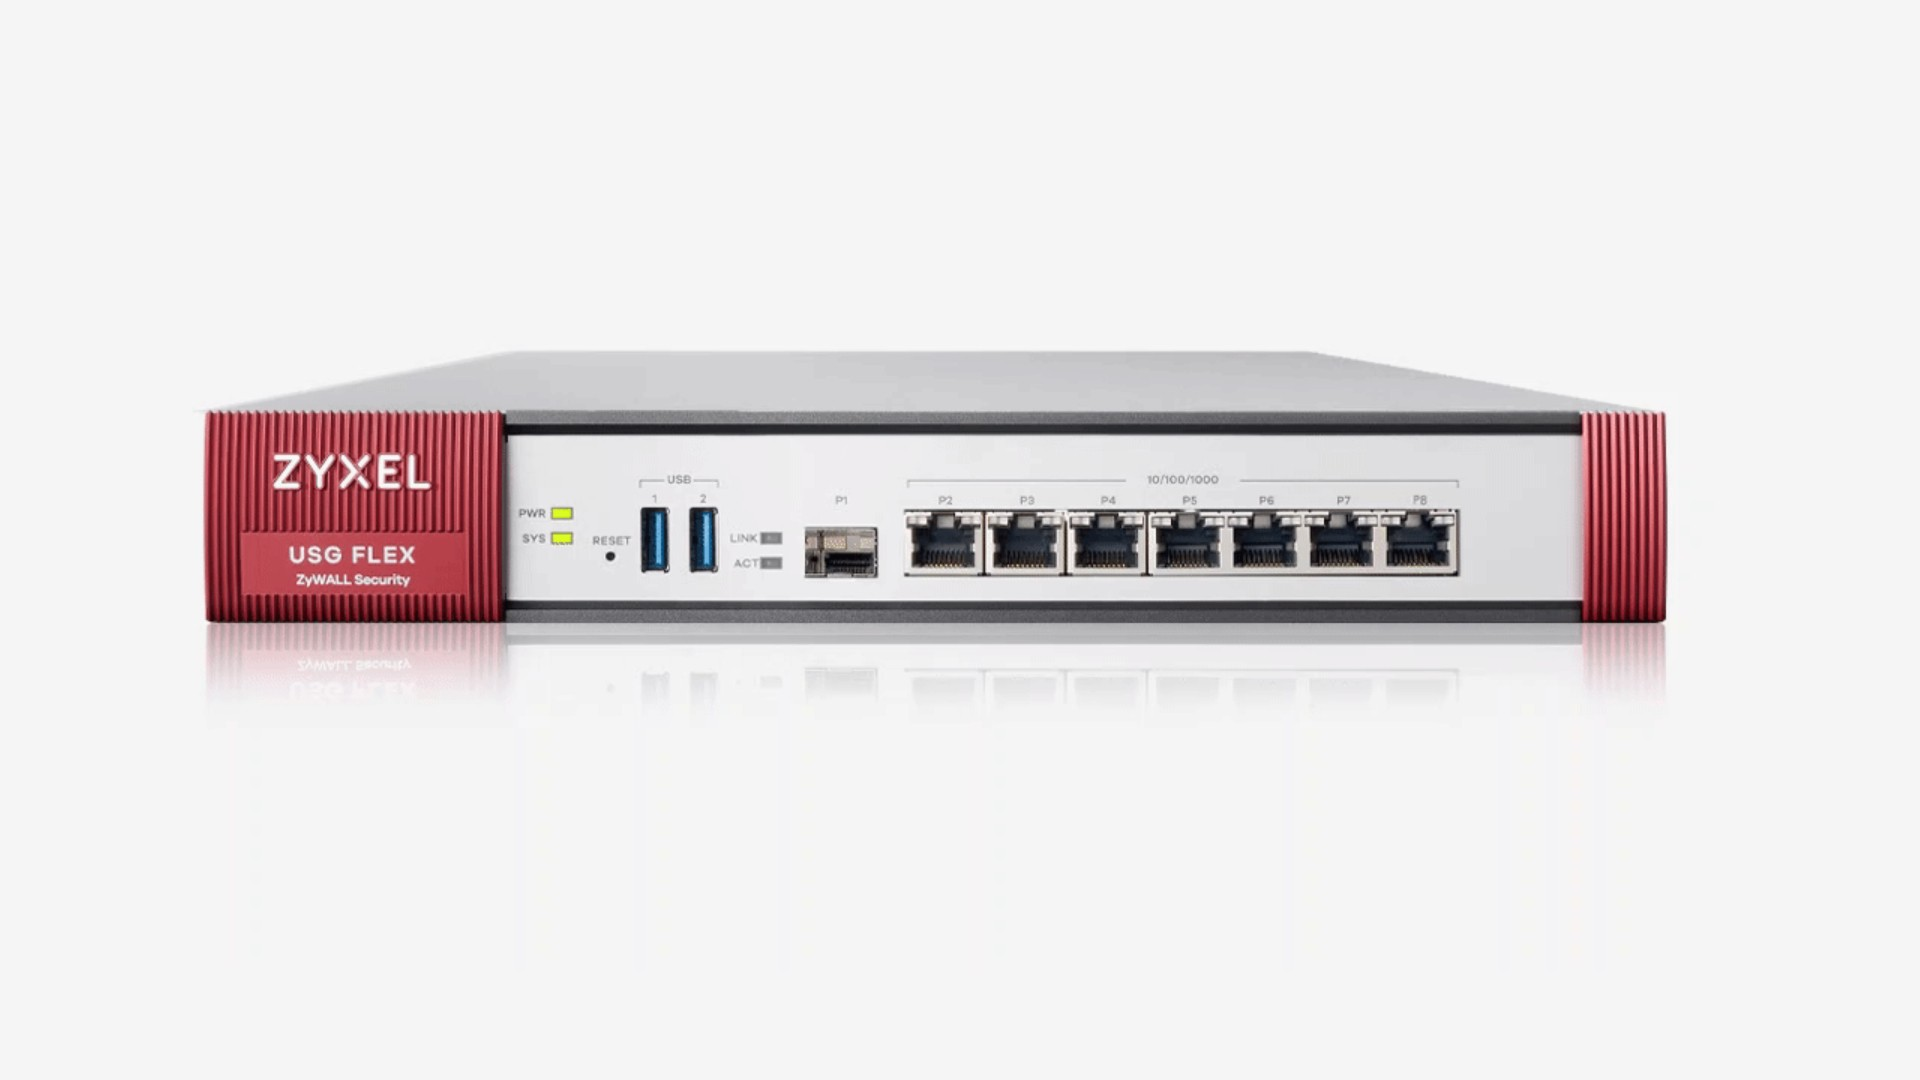 Zyxel USG Flex 200 firewall (hardware) 1800 Mbit/s